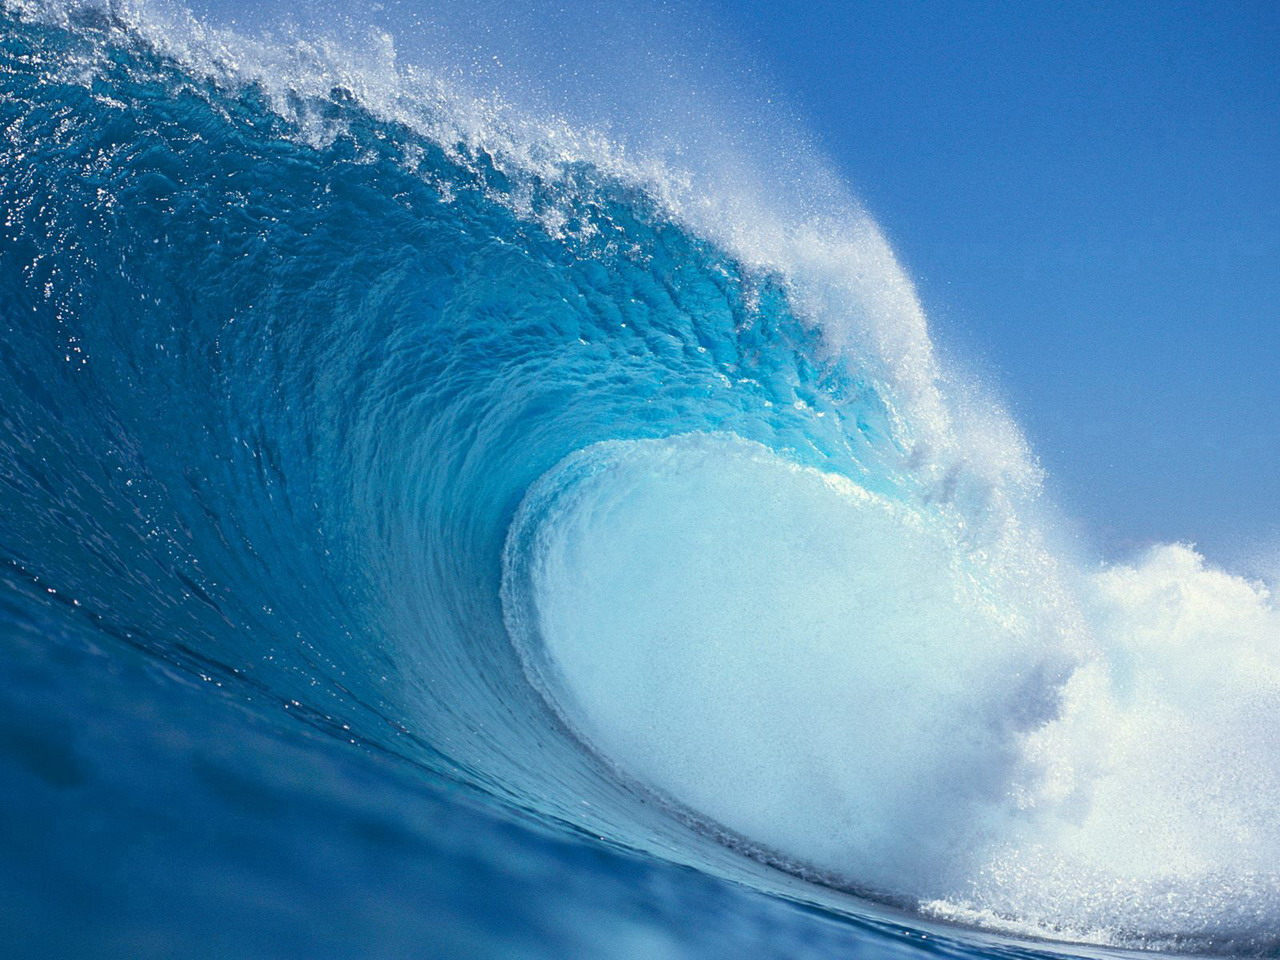 Fondos de olas | FONDOS DE PANTALLA Wallpapers